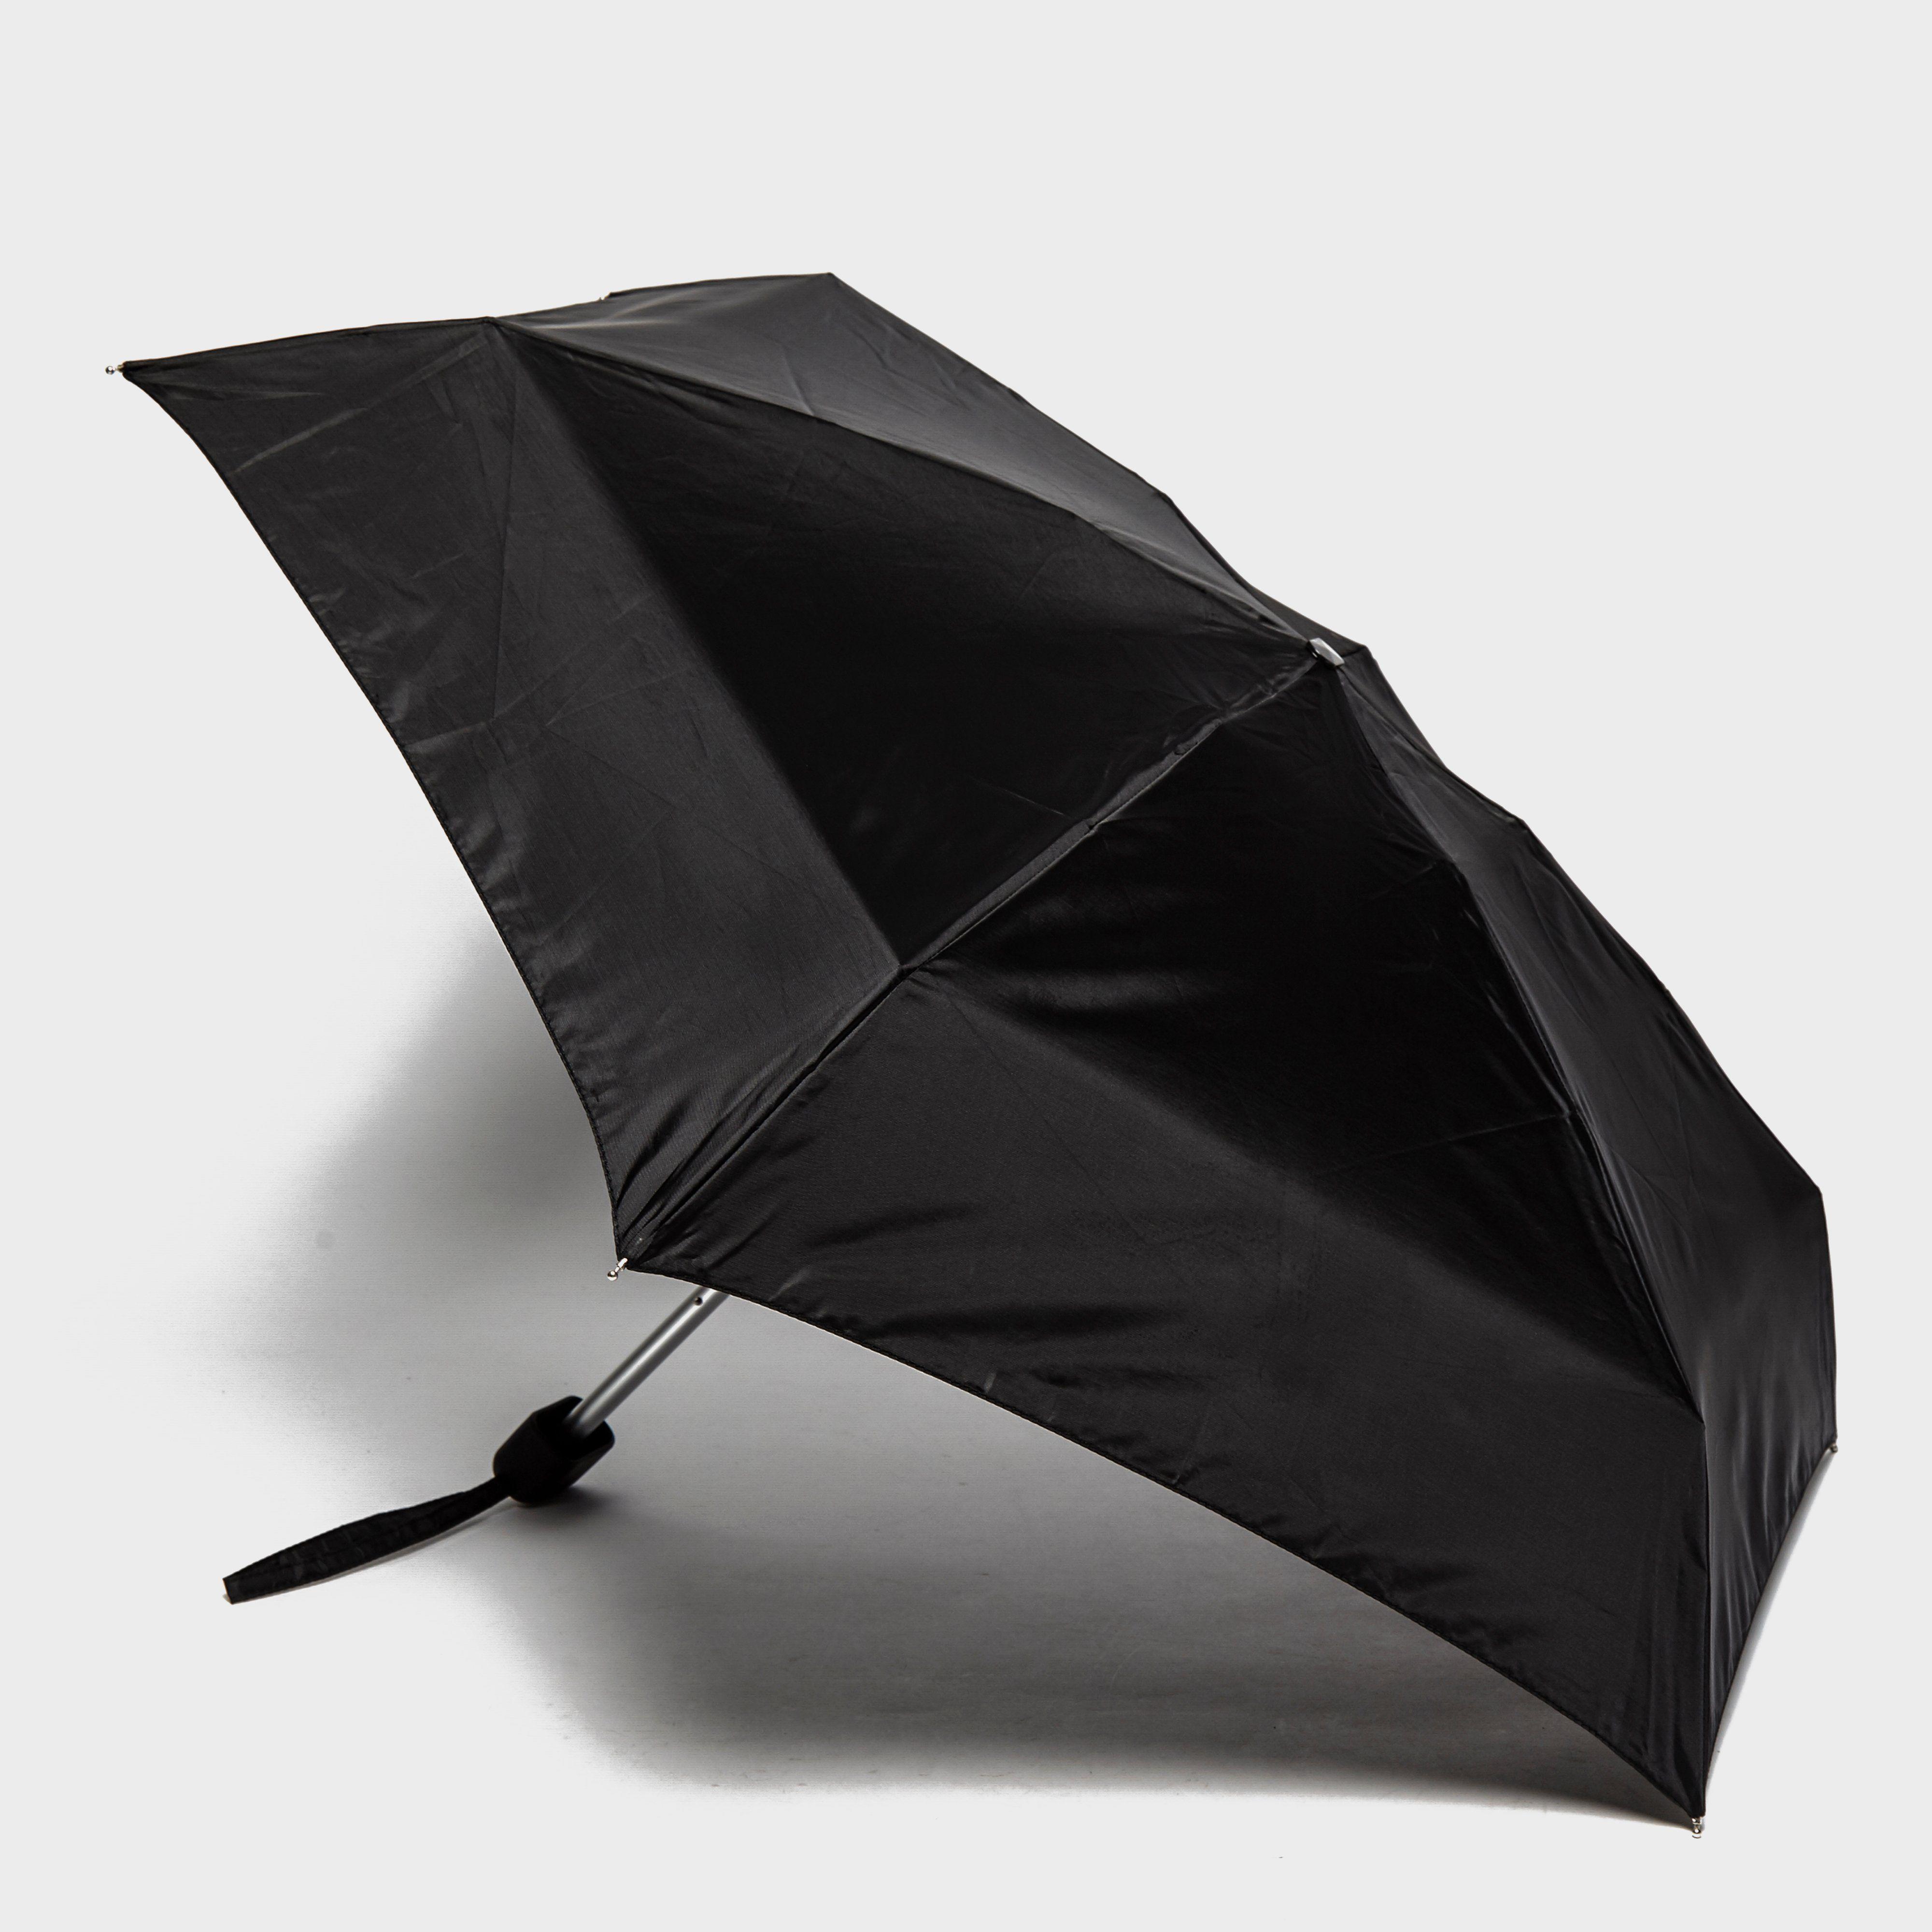 FULTON Tiny 1 Umbrella